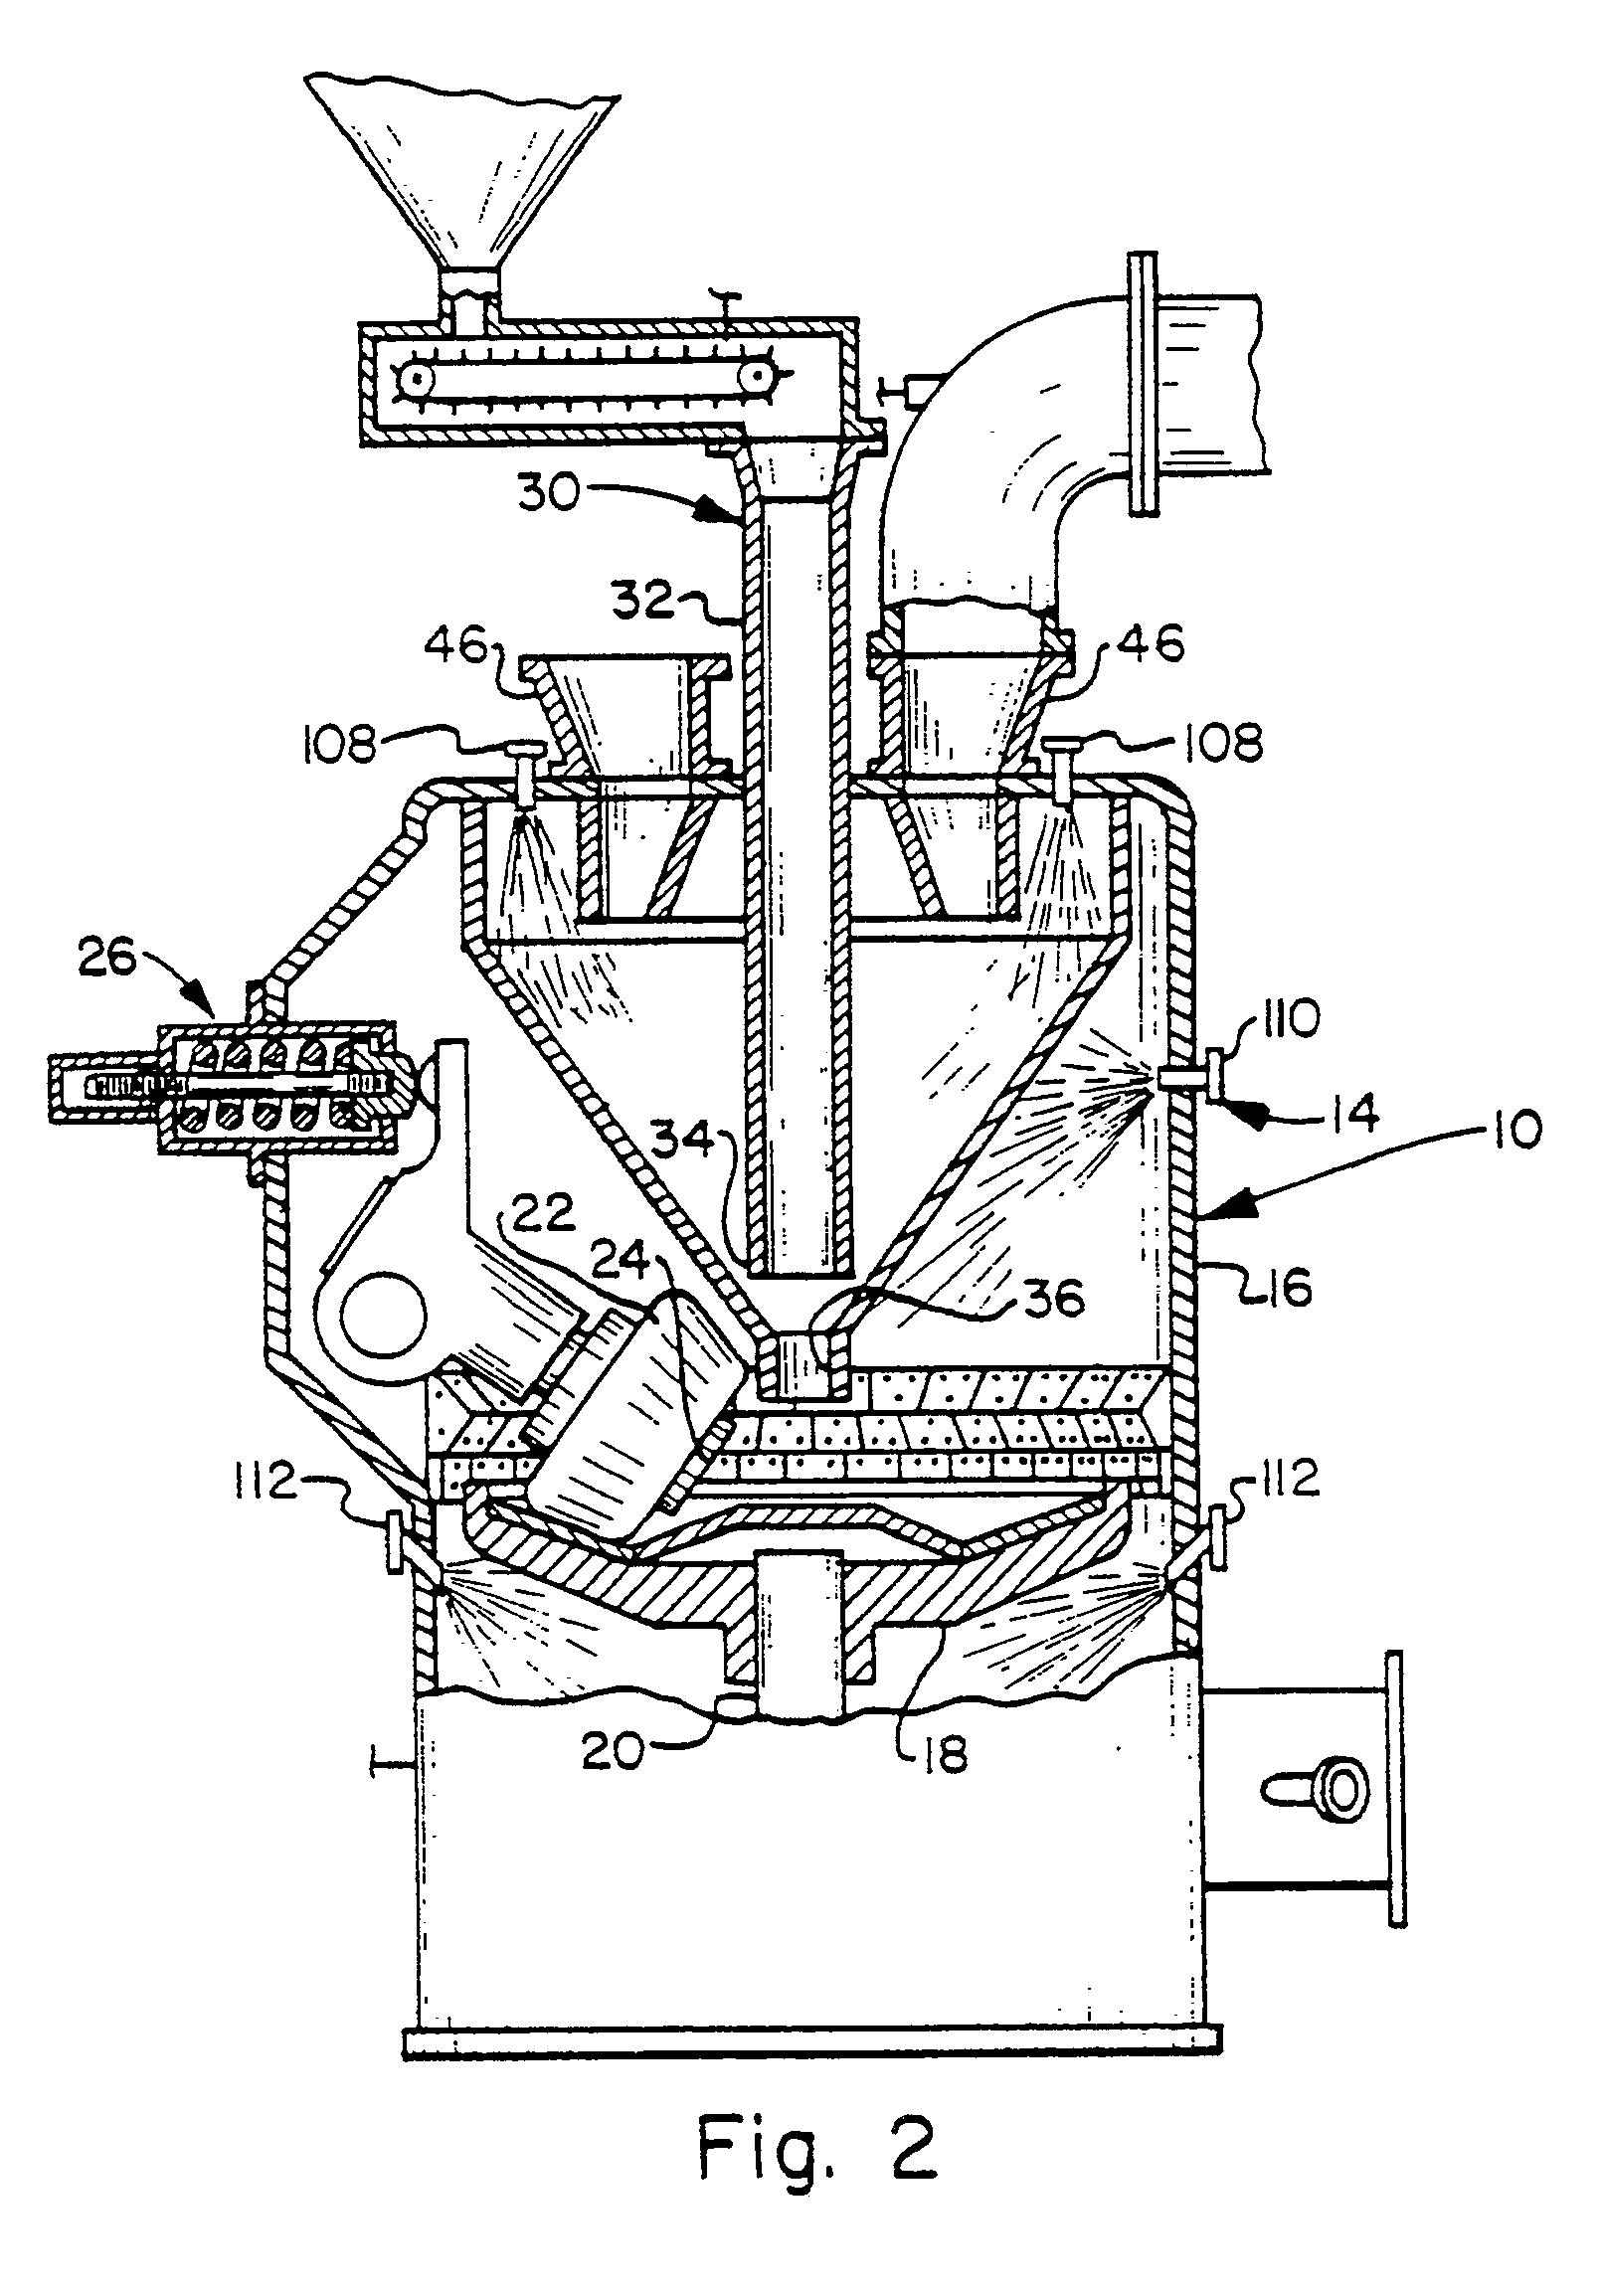 ball mill schematic for pinterest